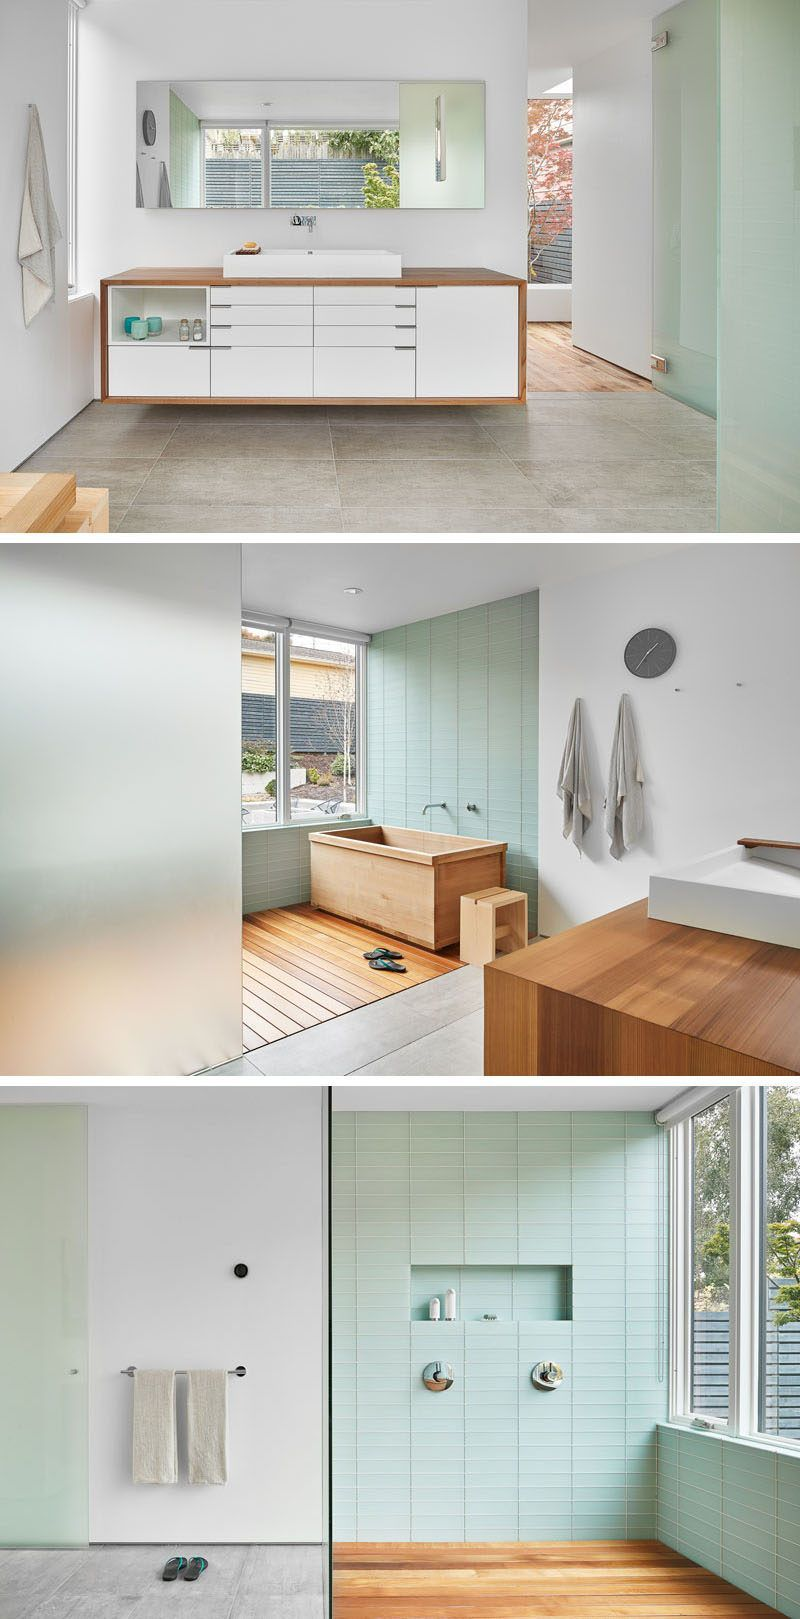 White bathroom interior design  bathroom tile ideas  tile ideas bathroom tiling and toilet